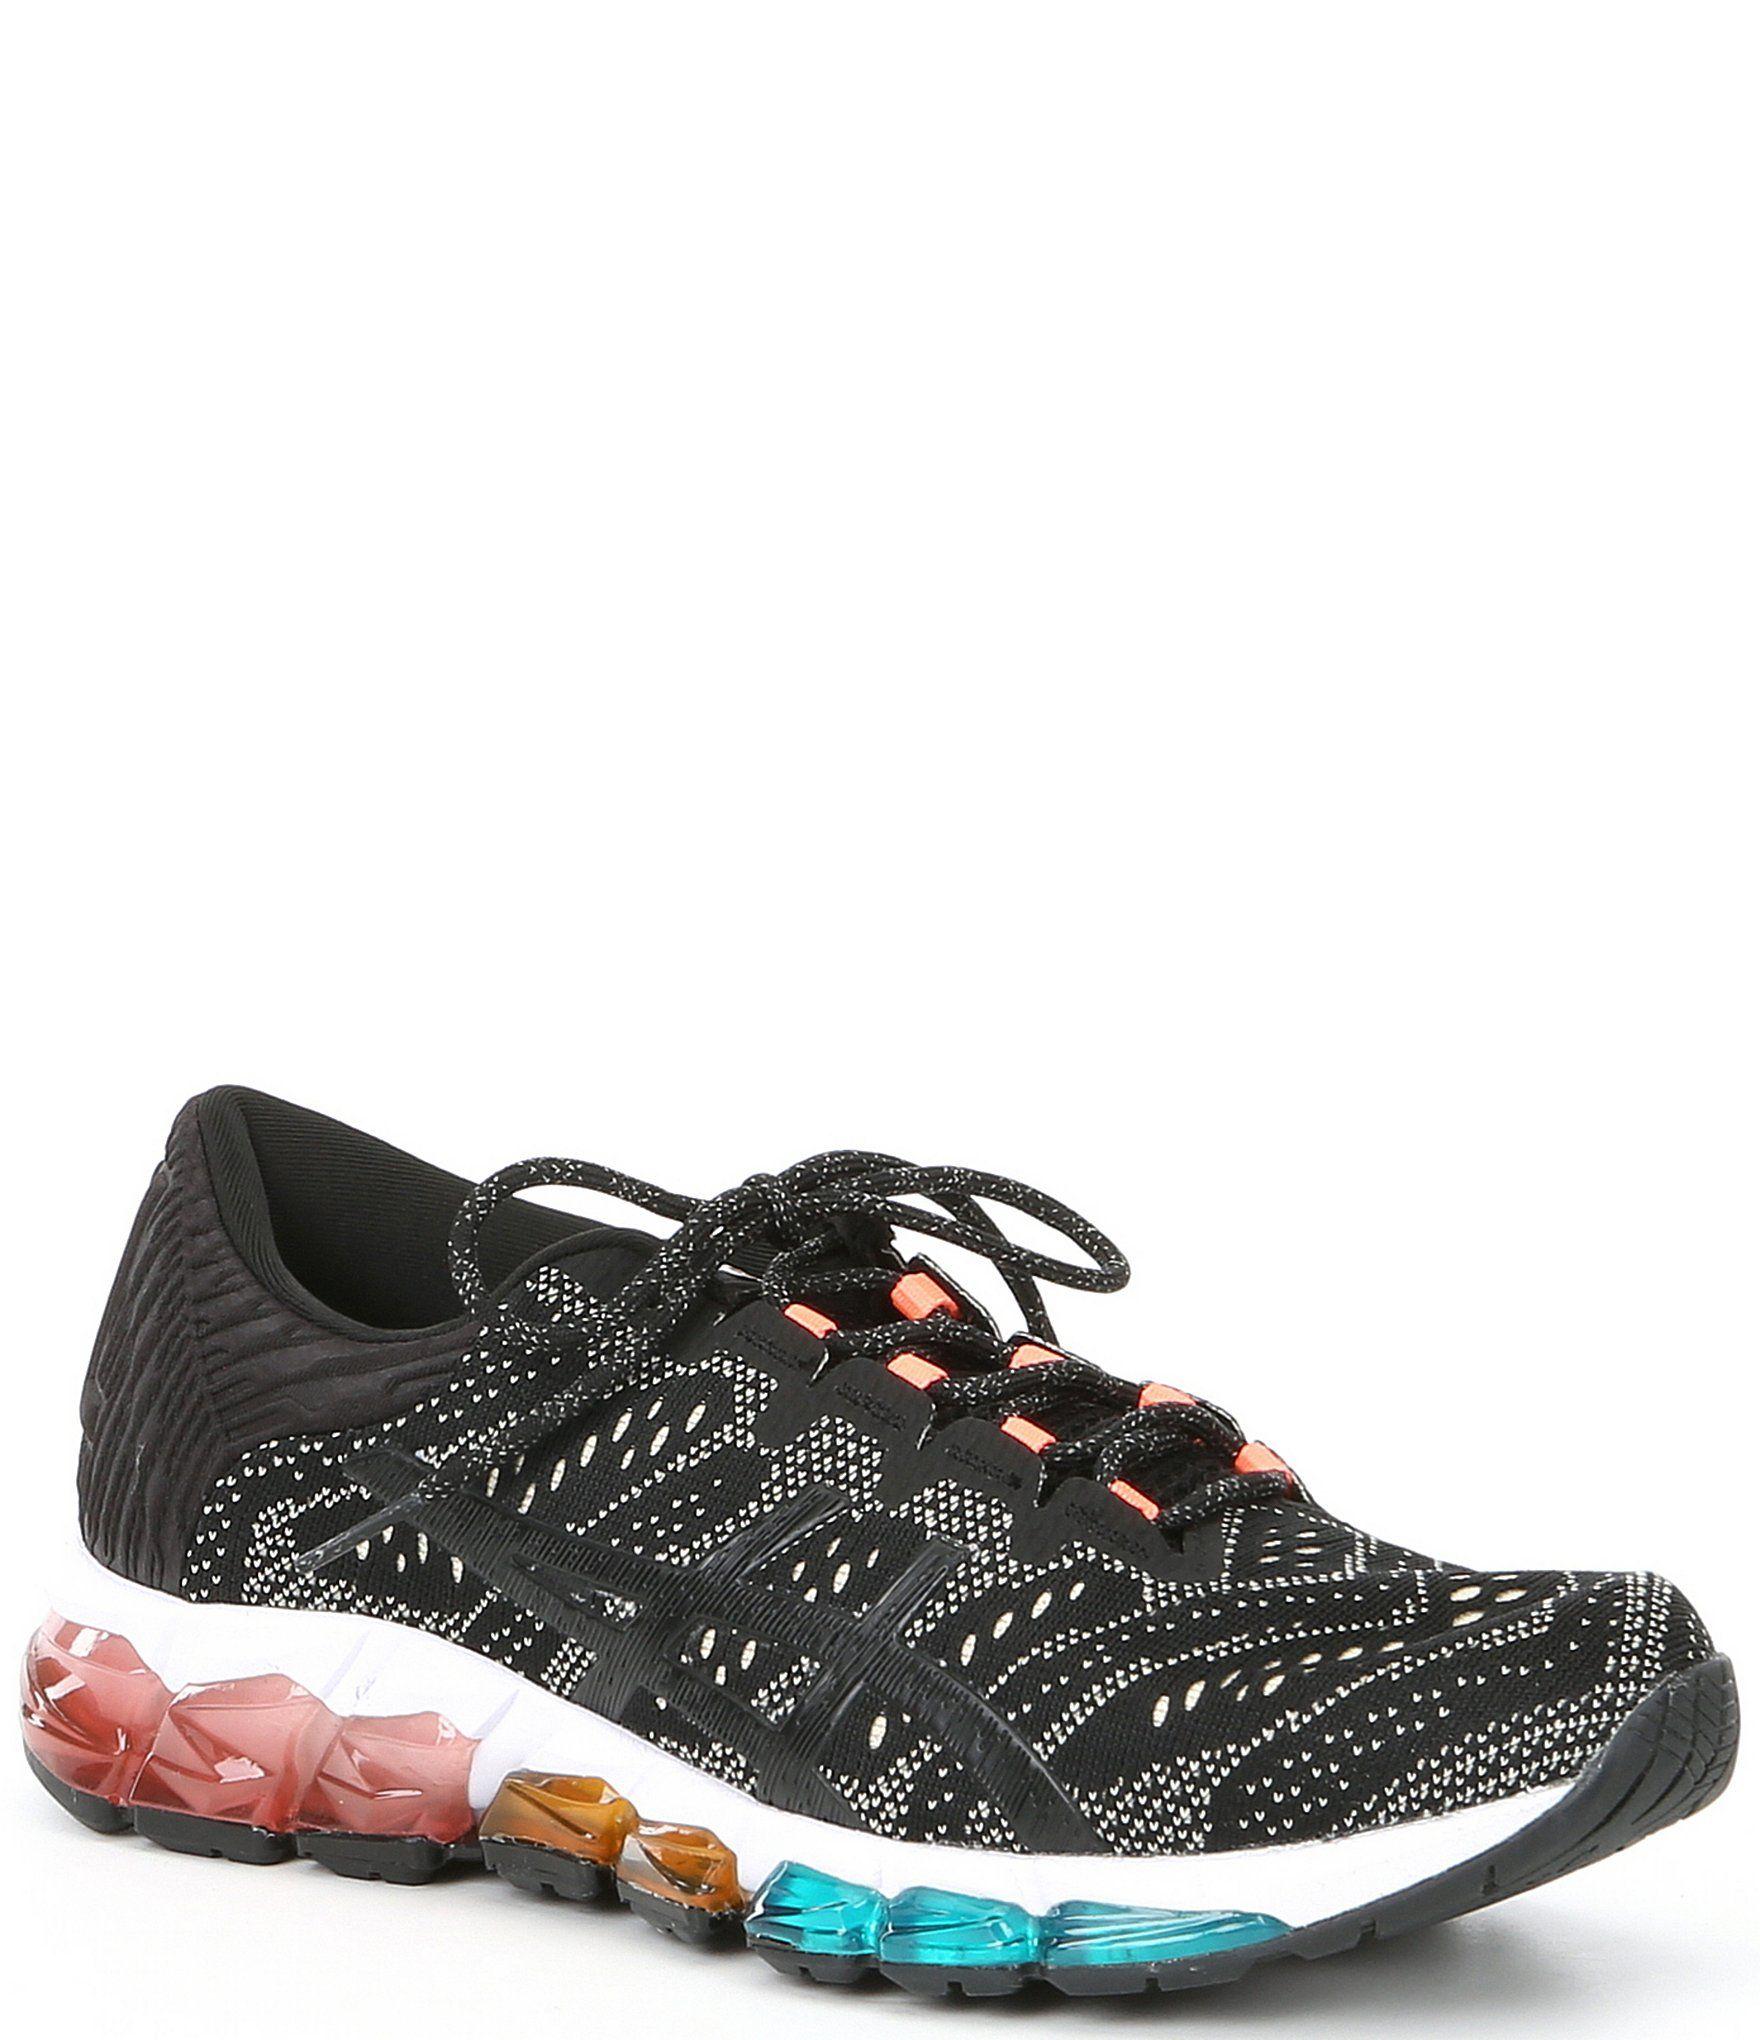 GEL-Quantum 360 5 JCQ Running Shoes